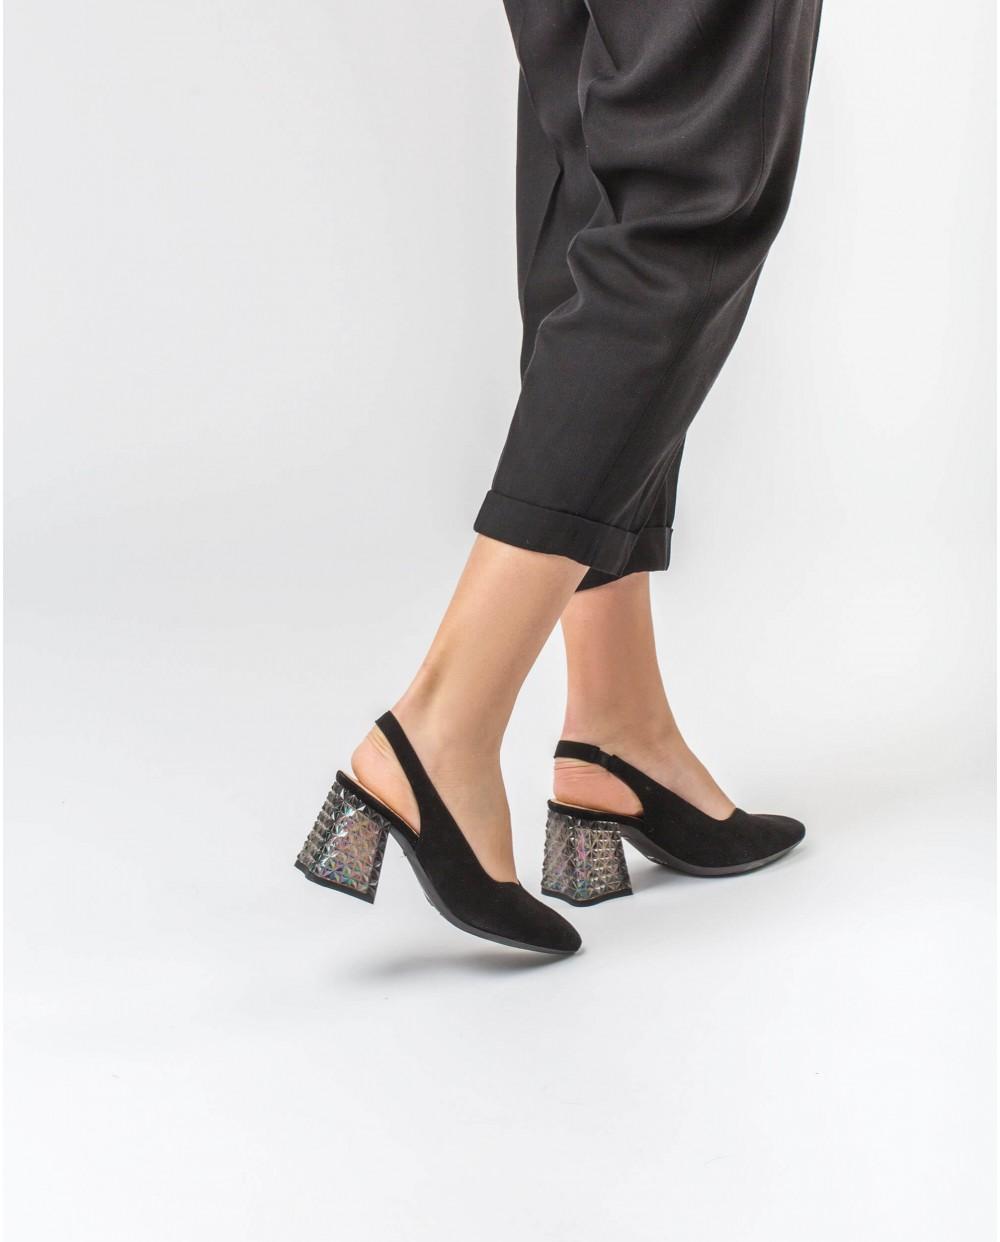 Wonders-Heels-High heeled shoe with jewel detail